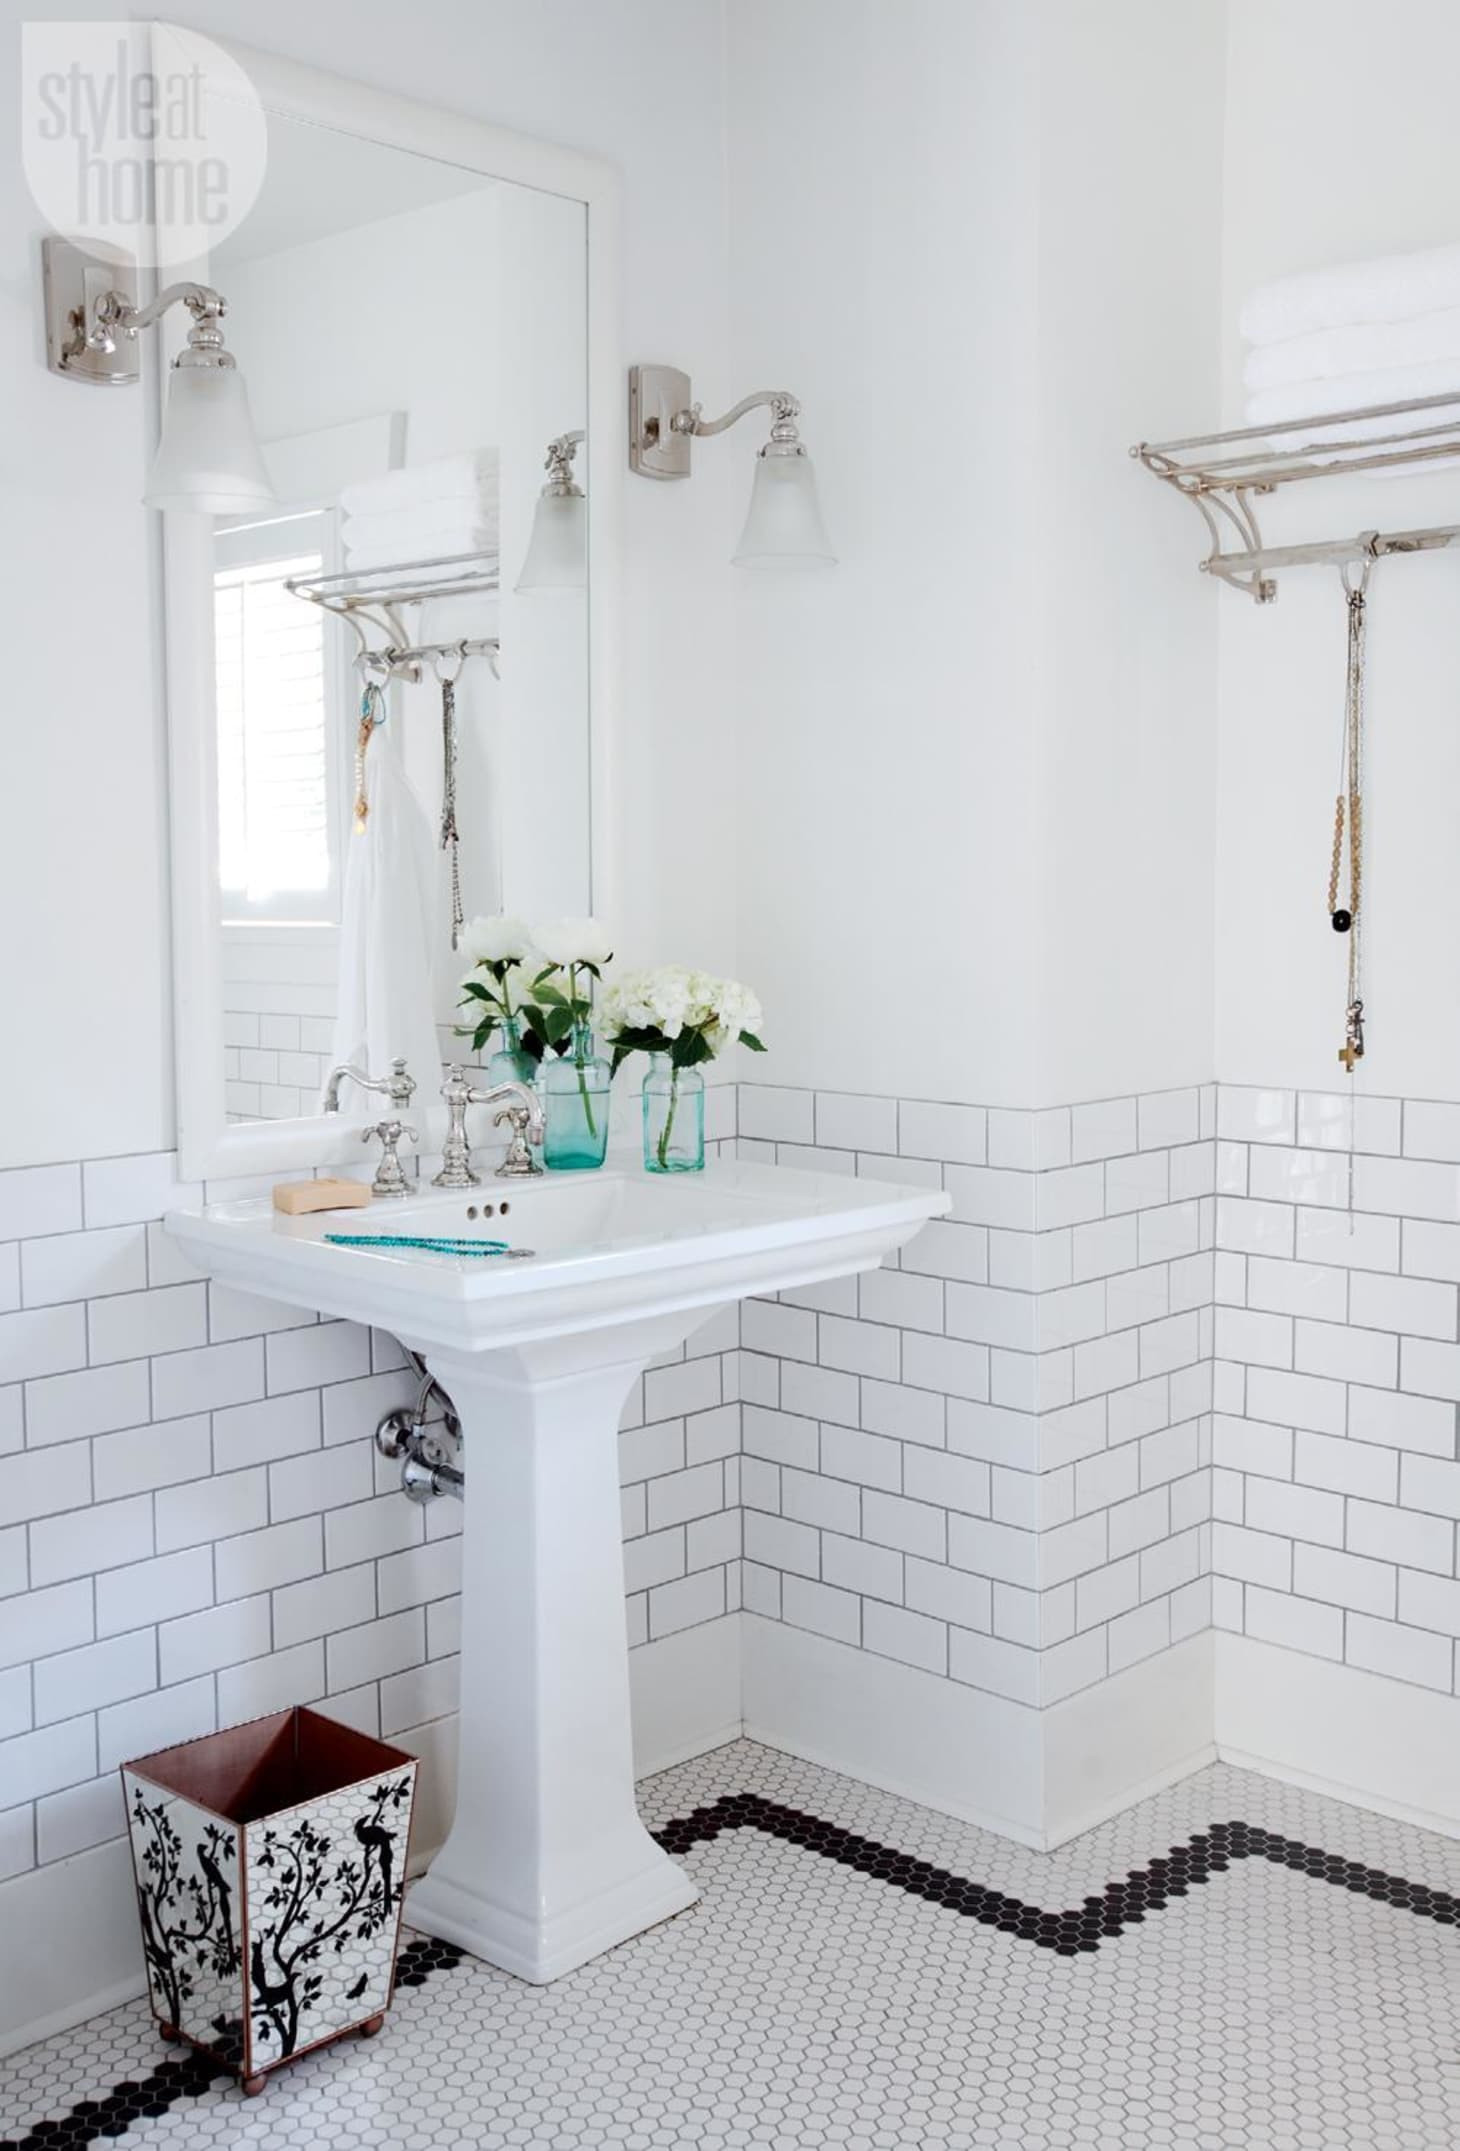 Vintage Bathroom Floor Tile New Mosaic Tile Floor Ideas for Vintage Style Bathrooms